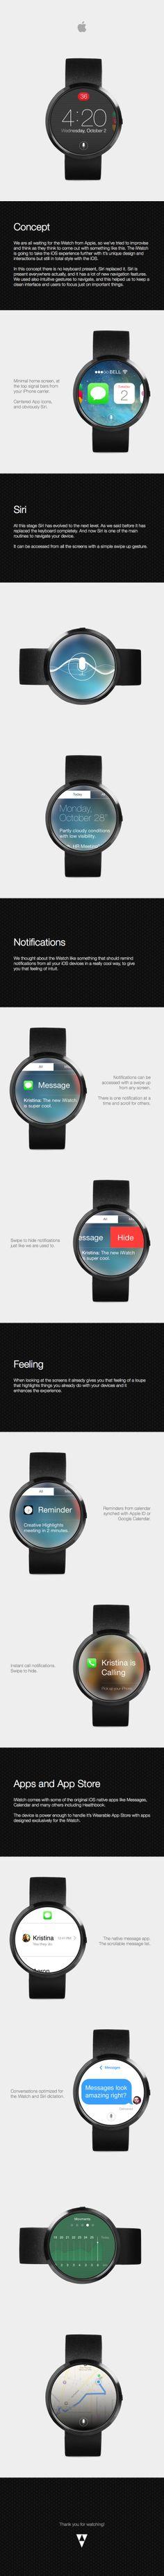 iWatch & Wearable iOS Concept by Luan Gjokaj, via Behance #iwatch #smartwatch #apple #watch #concept